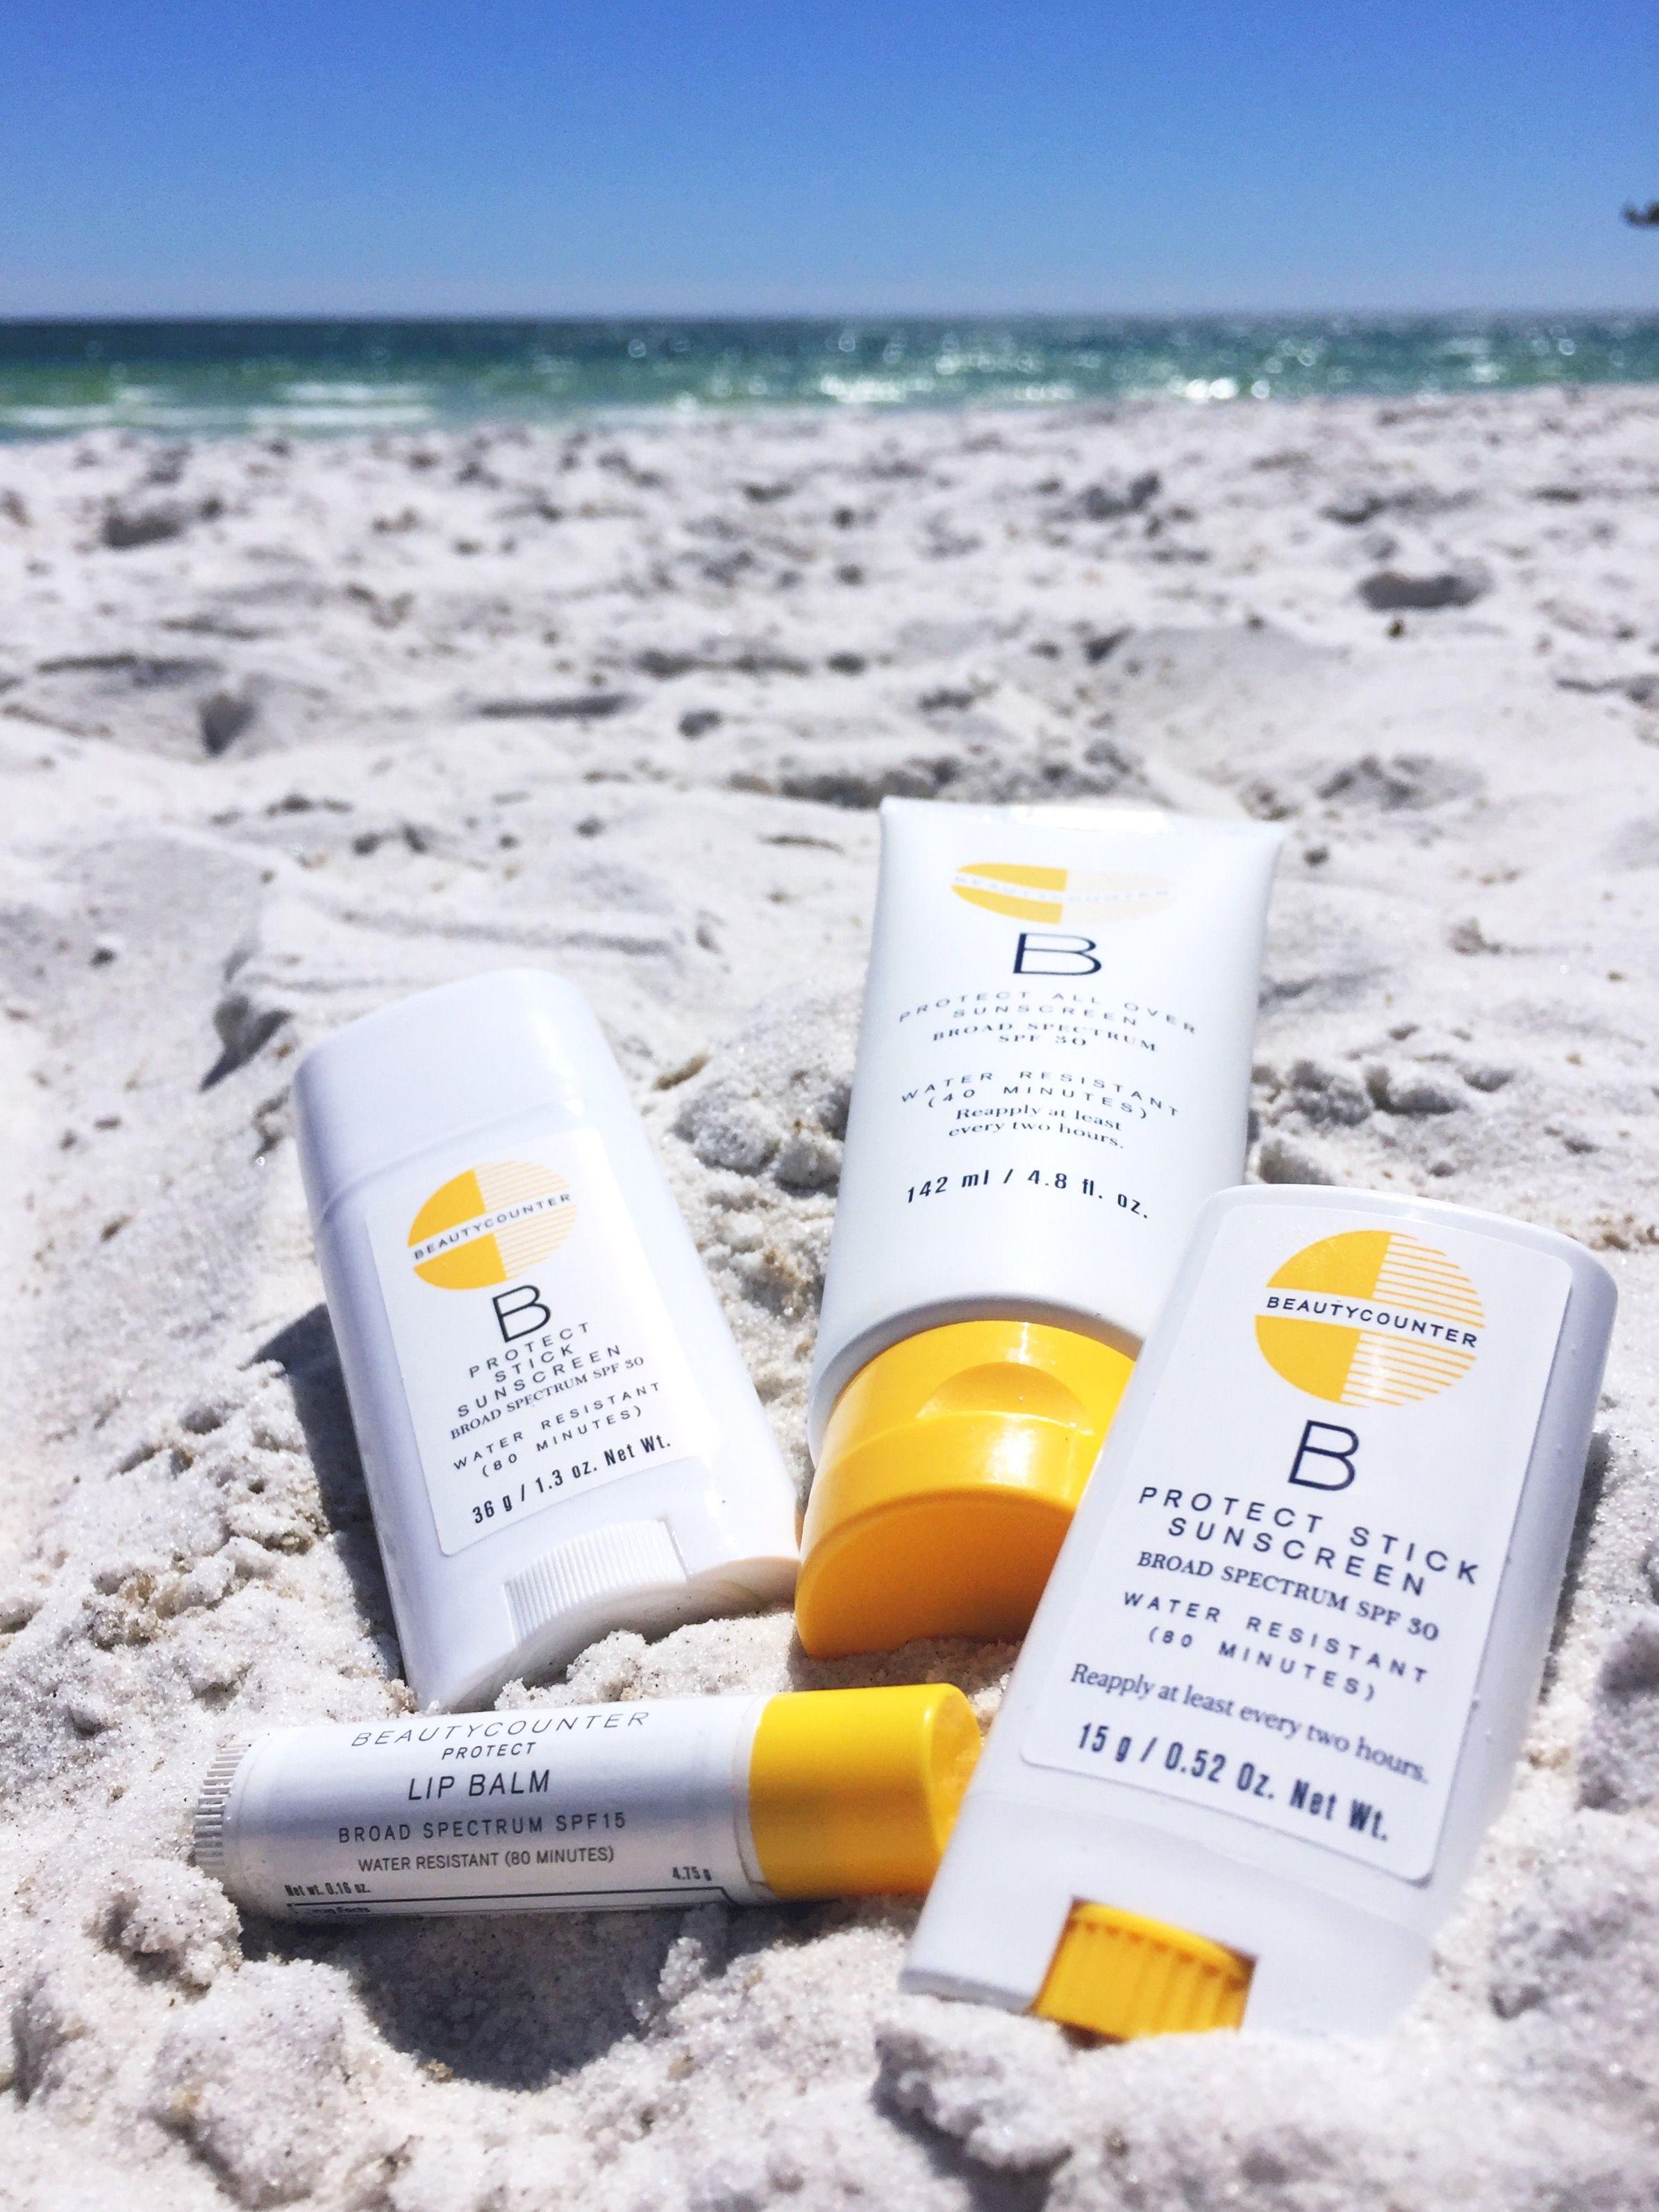 Always wear a nonnano zinc or titanium dioxide sunscreen